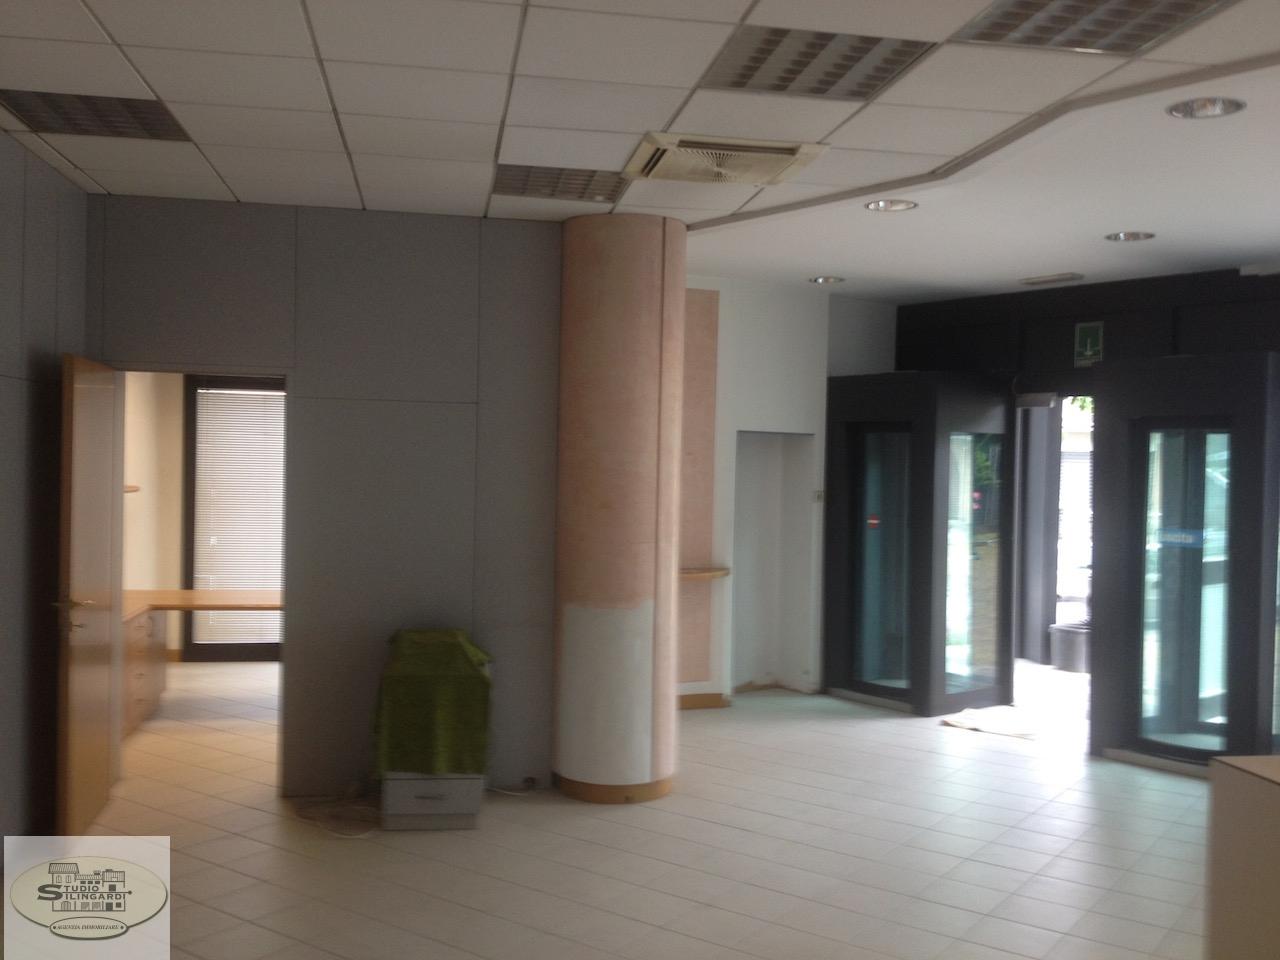 Ufficio Affitto FORMIGINE Formigine Mq 115 euro 1200